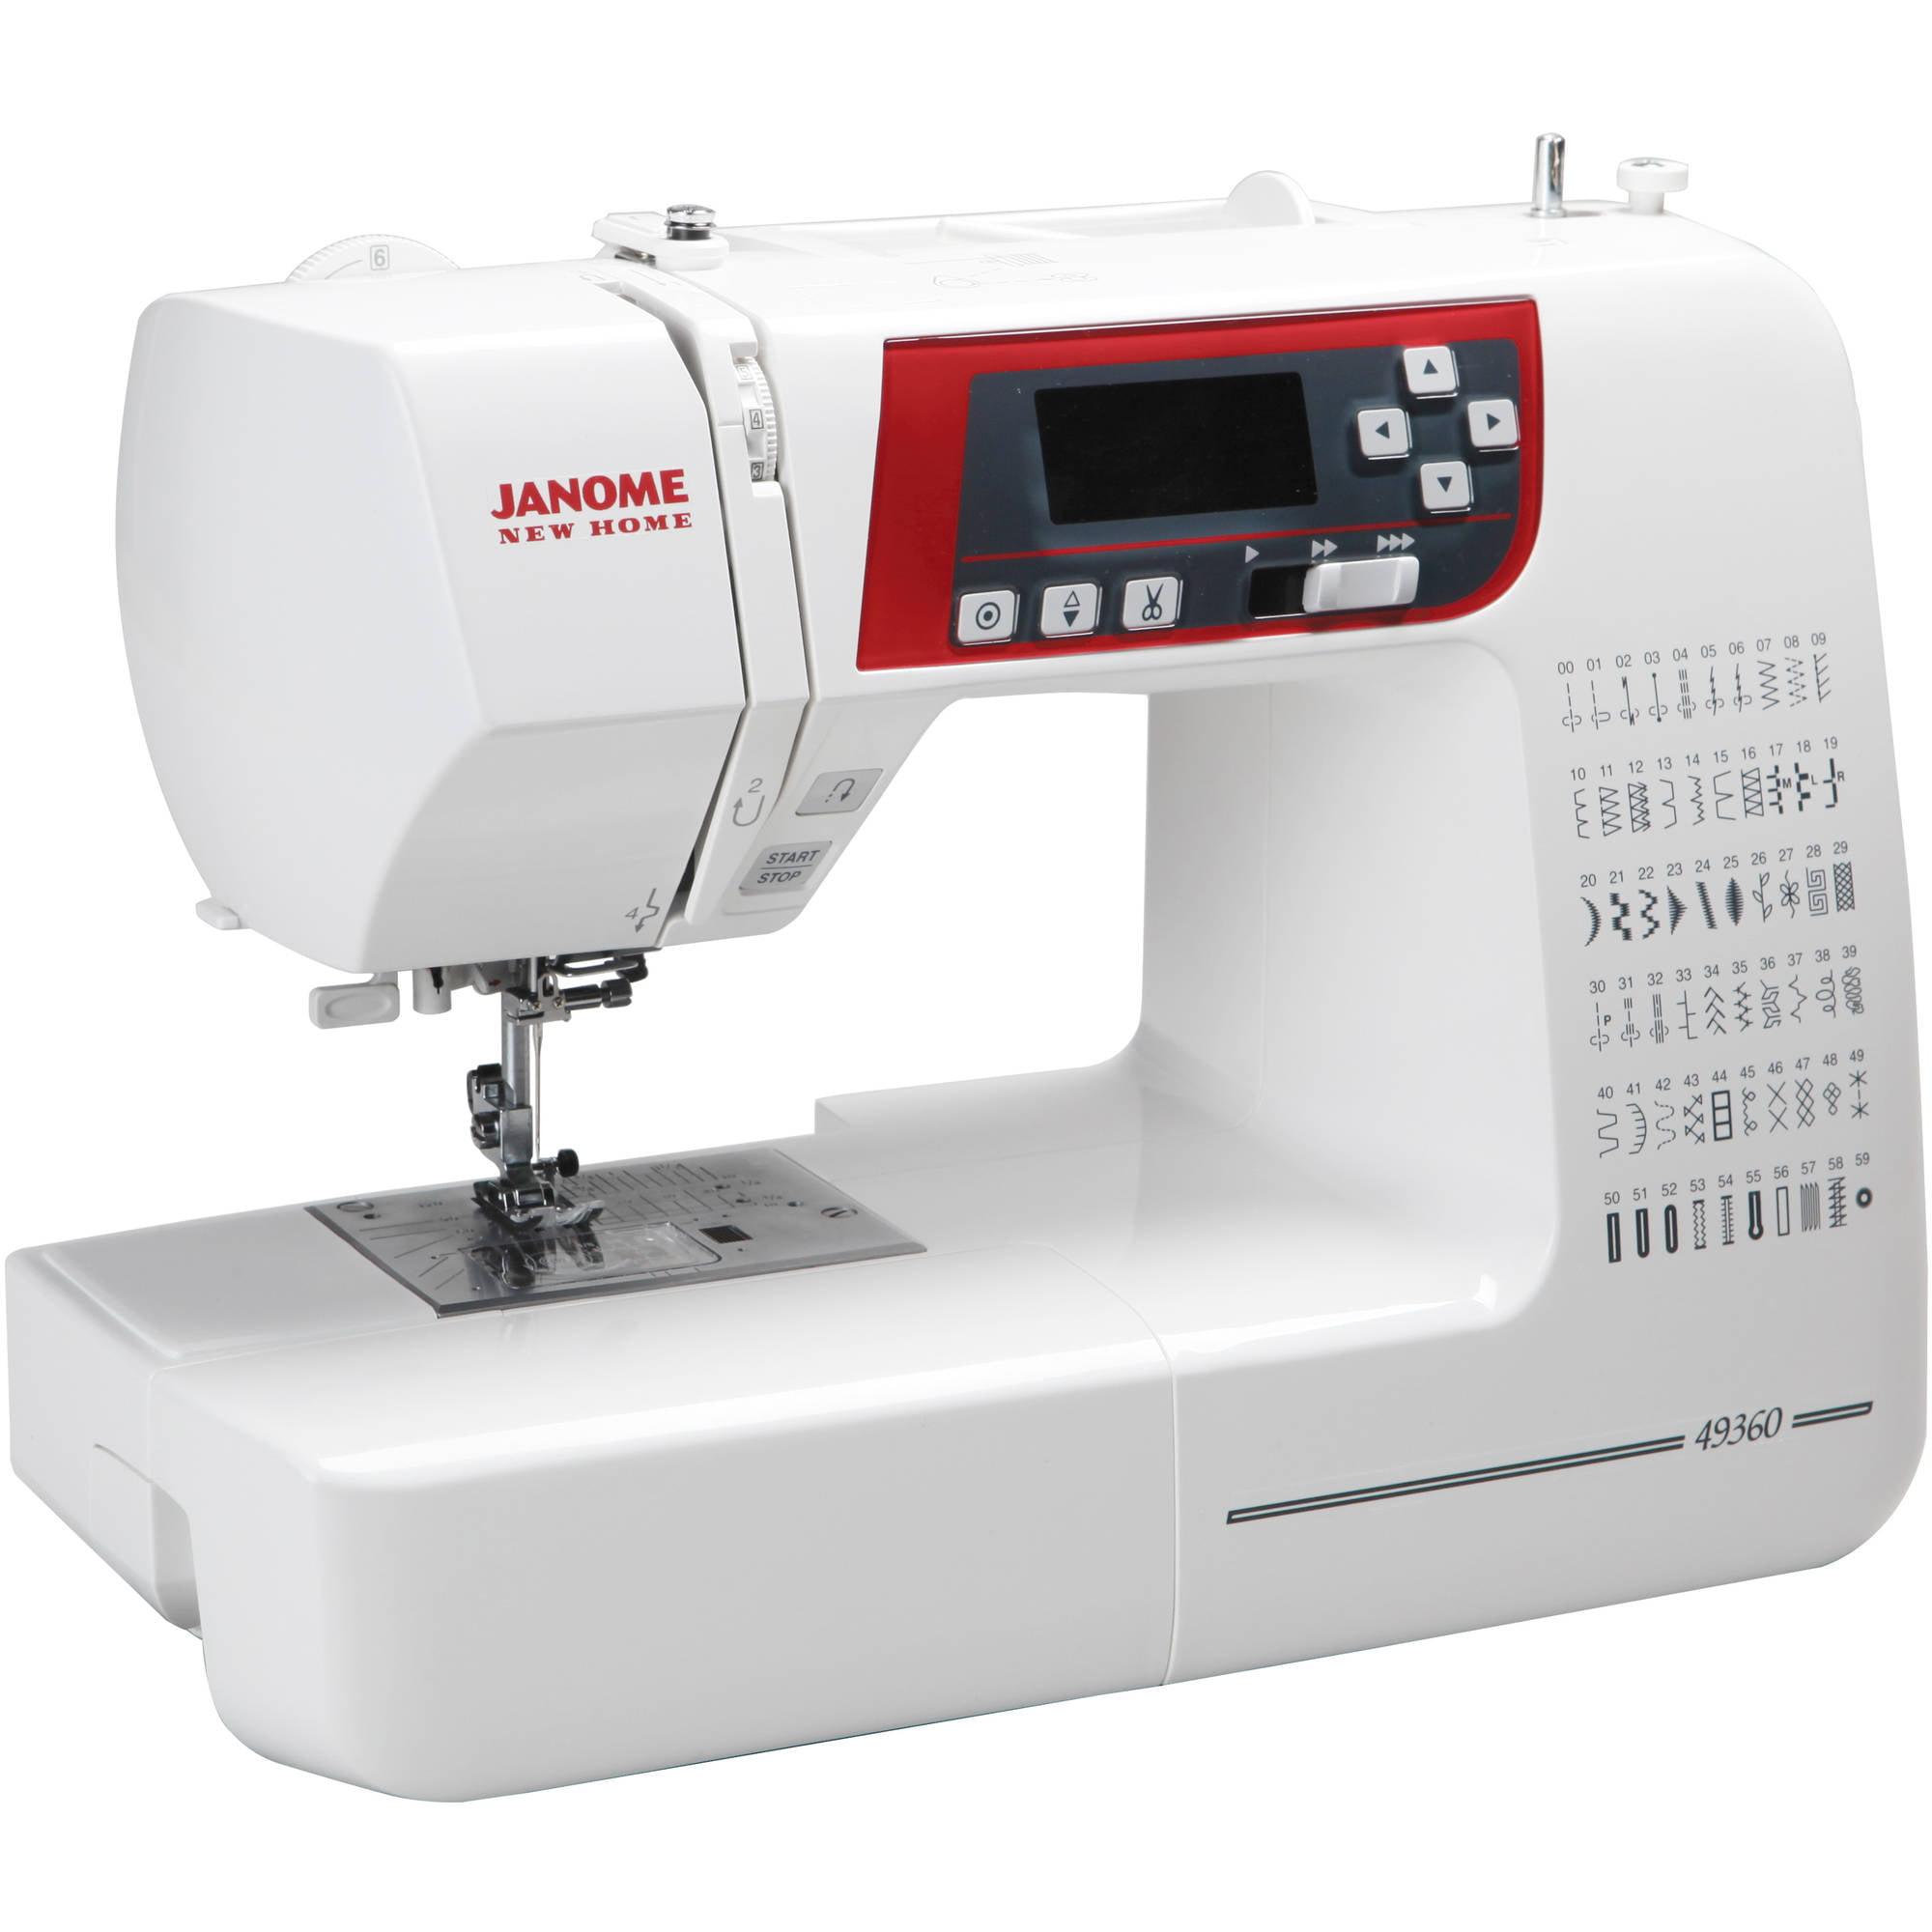 net quilt janome url exclusive com computerized getimage bundle sewing with bonus shld machine quilting bigcommerce